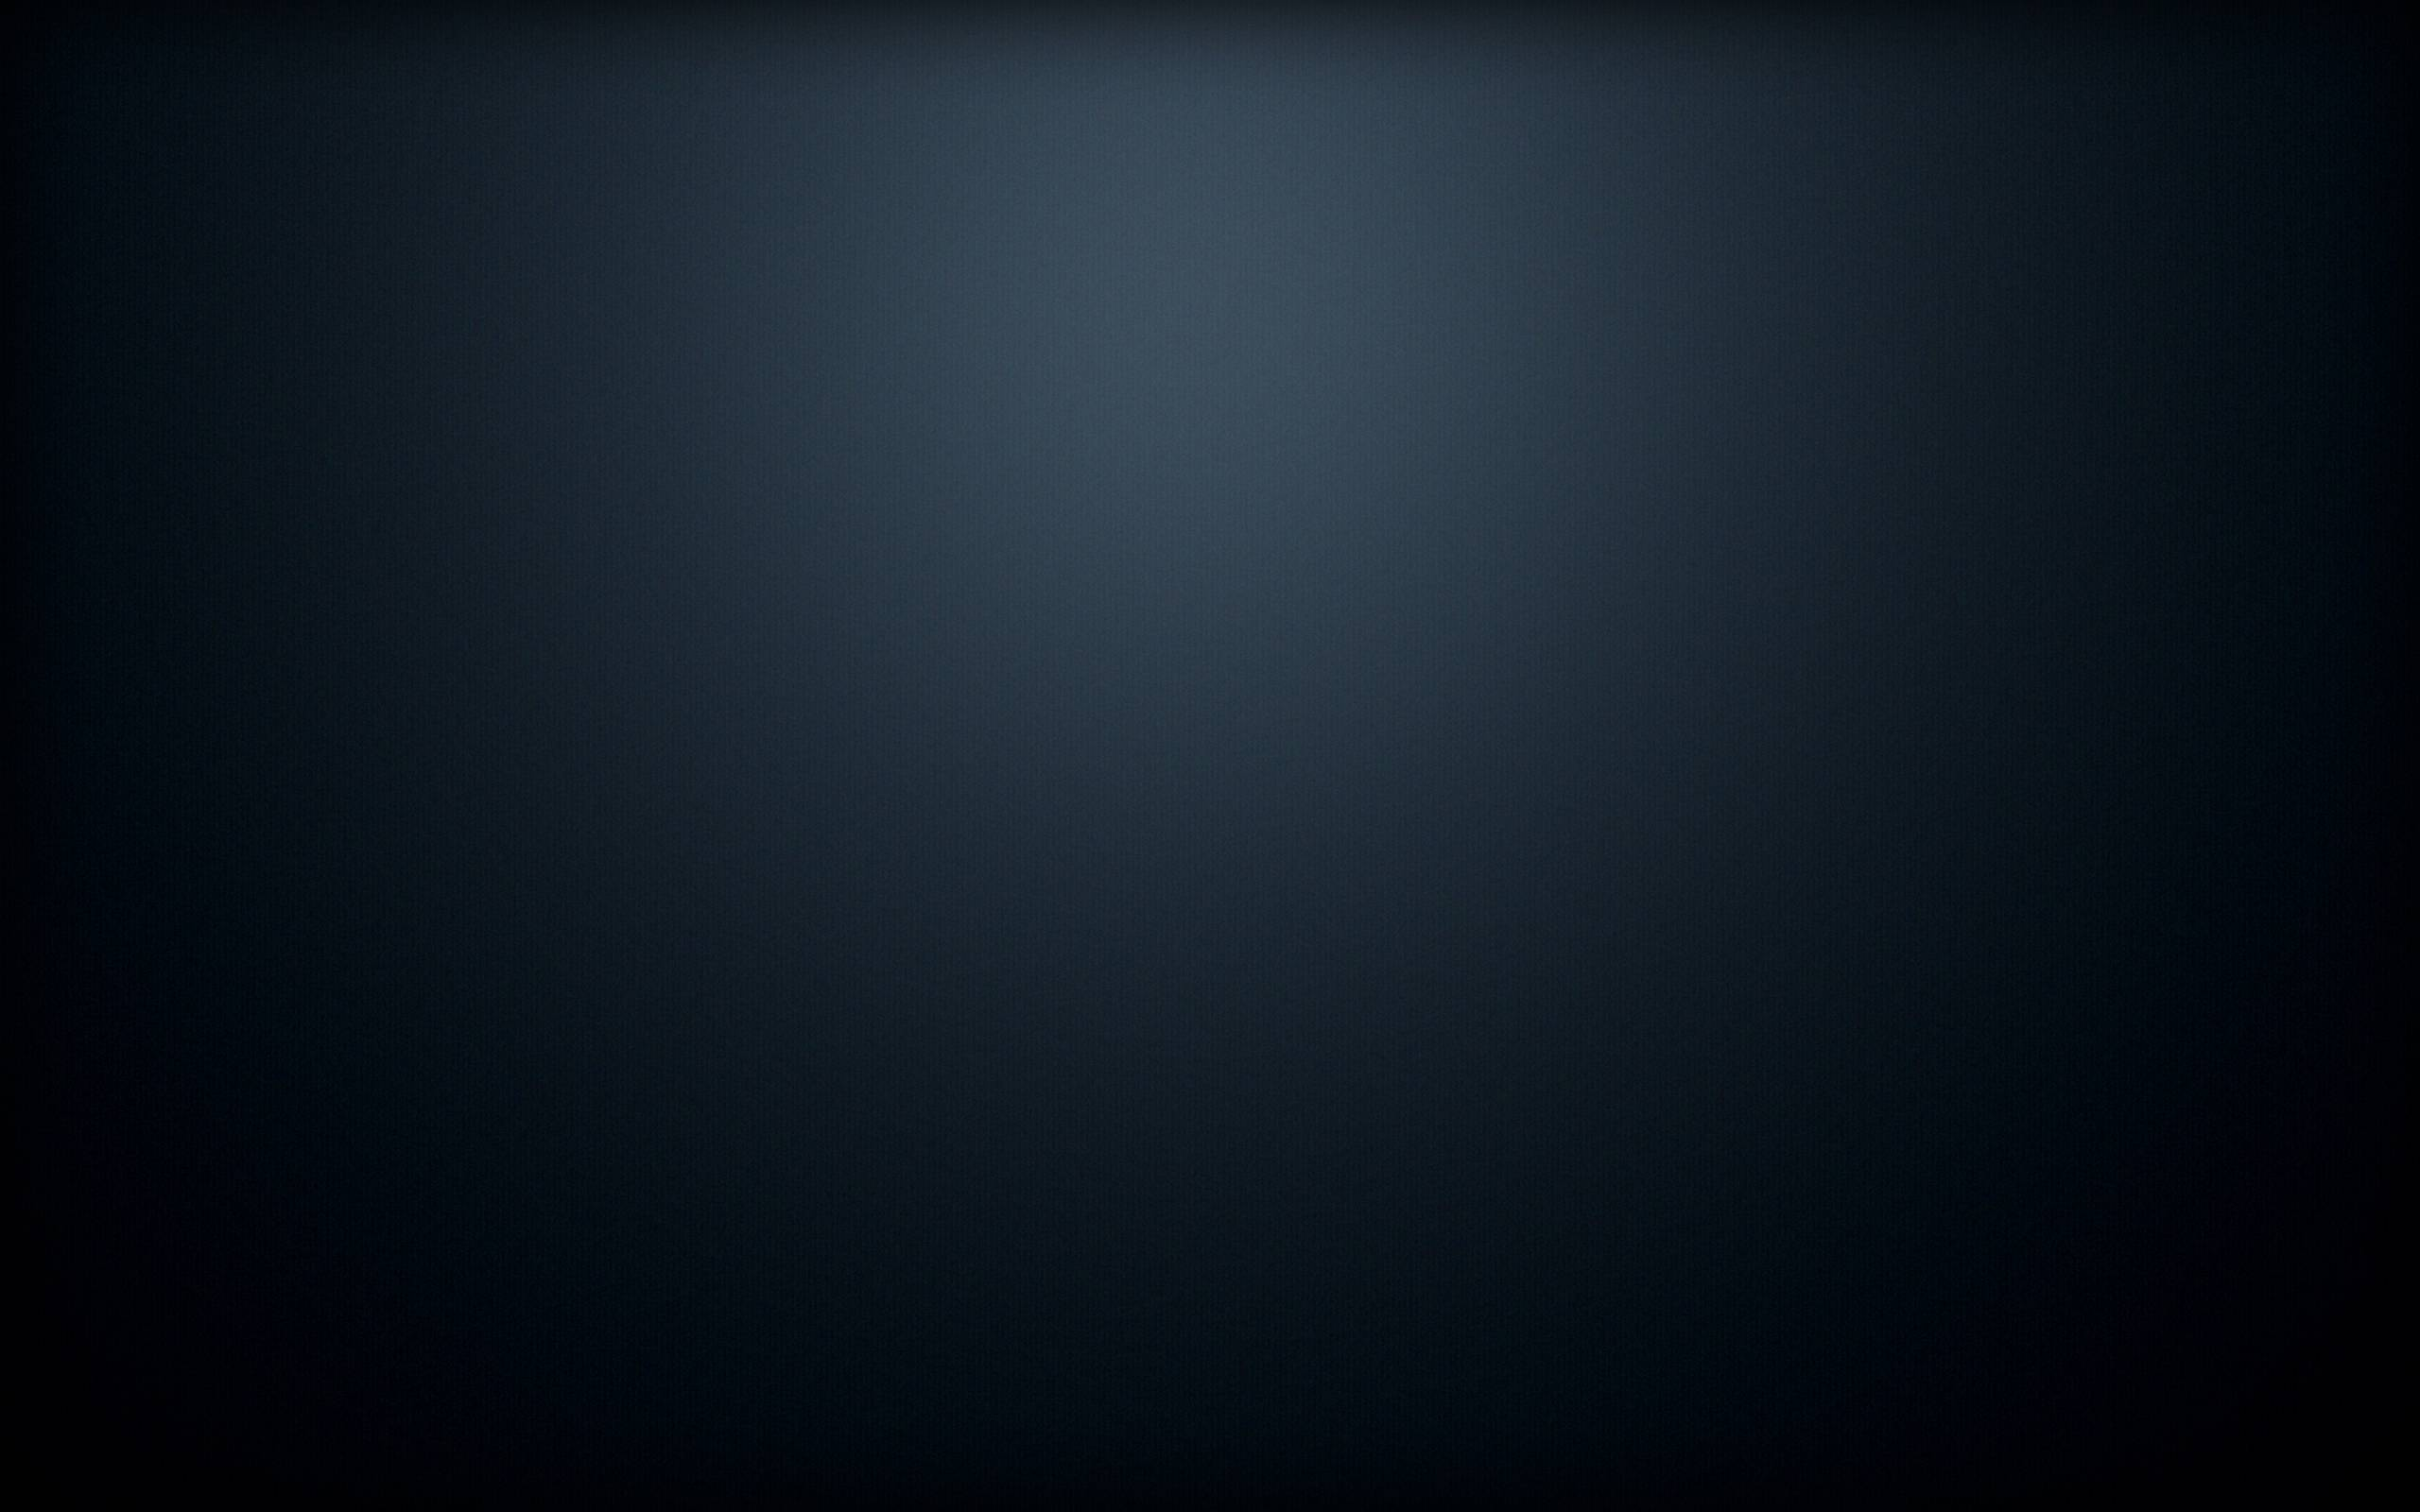 Dark Wallpapers HD 2560x1600